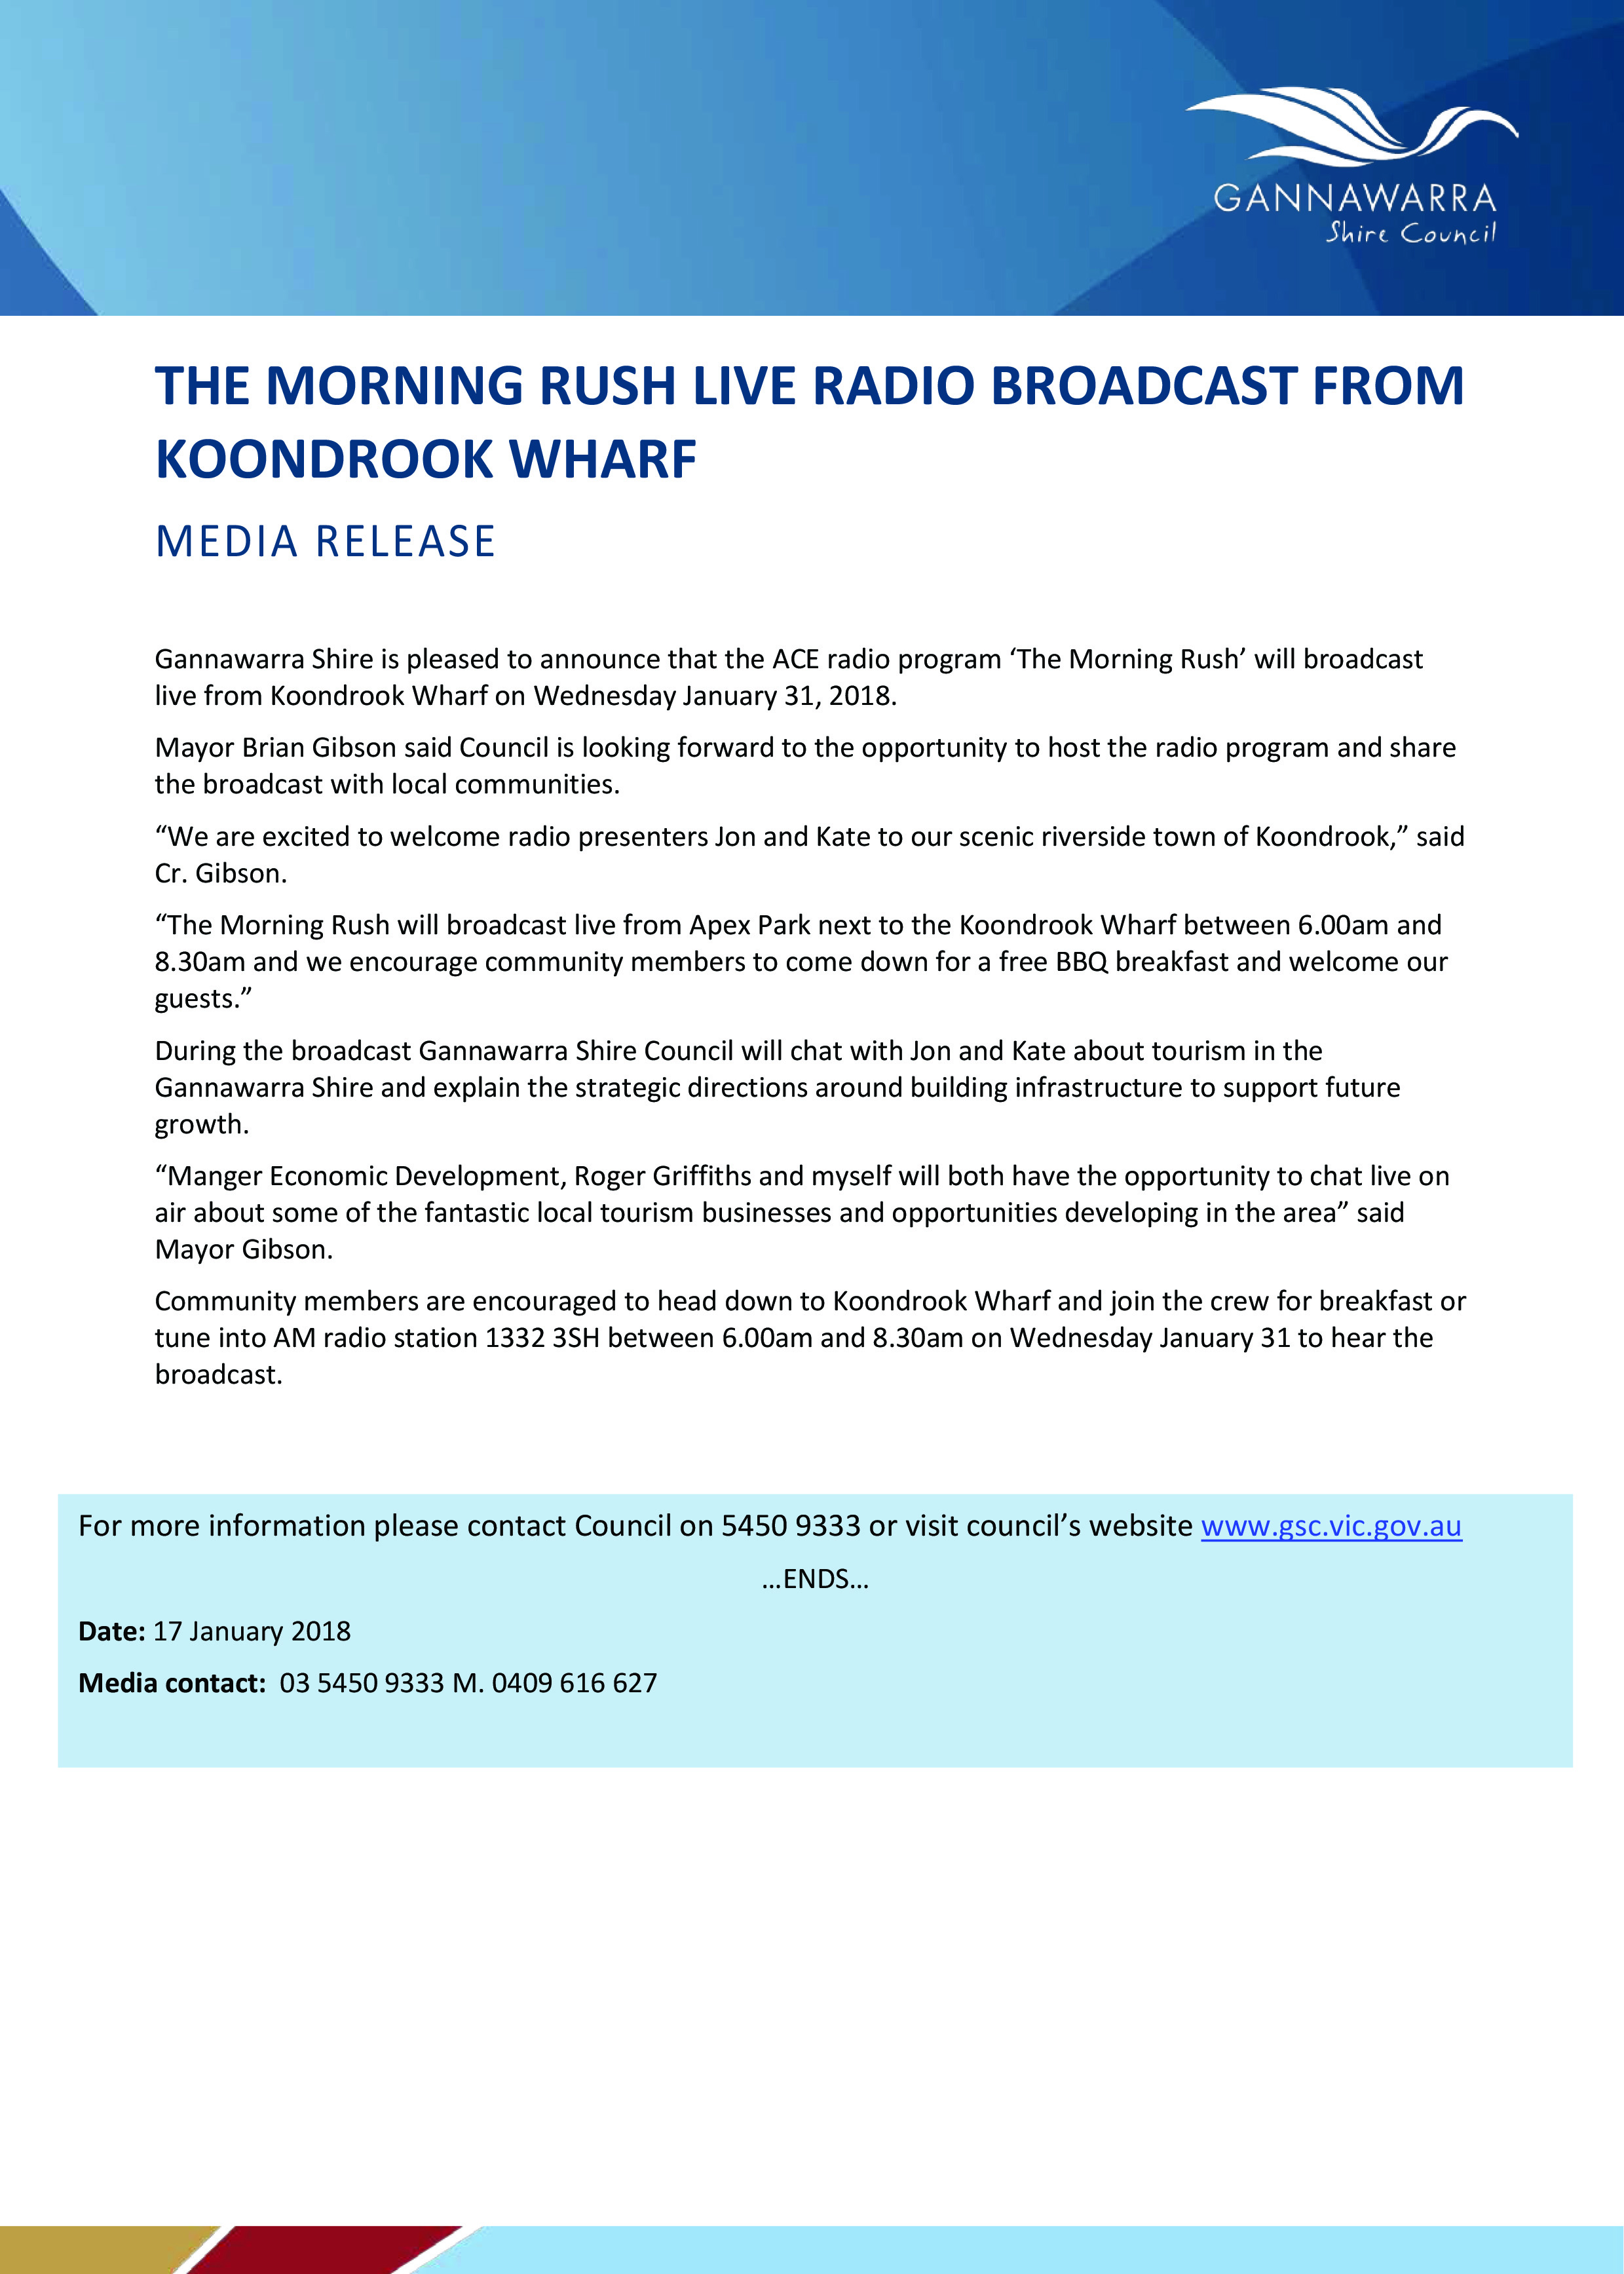 The Morning Rush Live Radio Broadcast From Koondrook Wharf